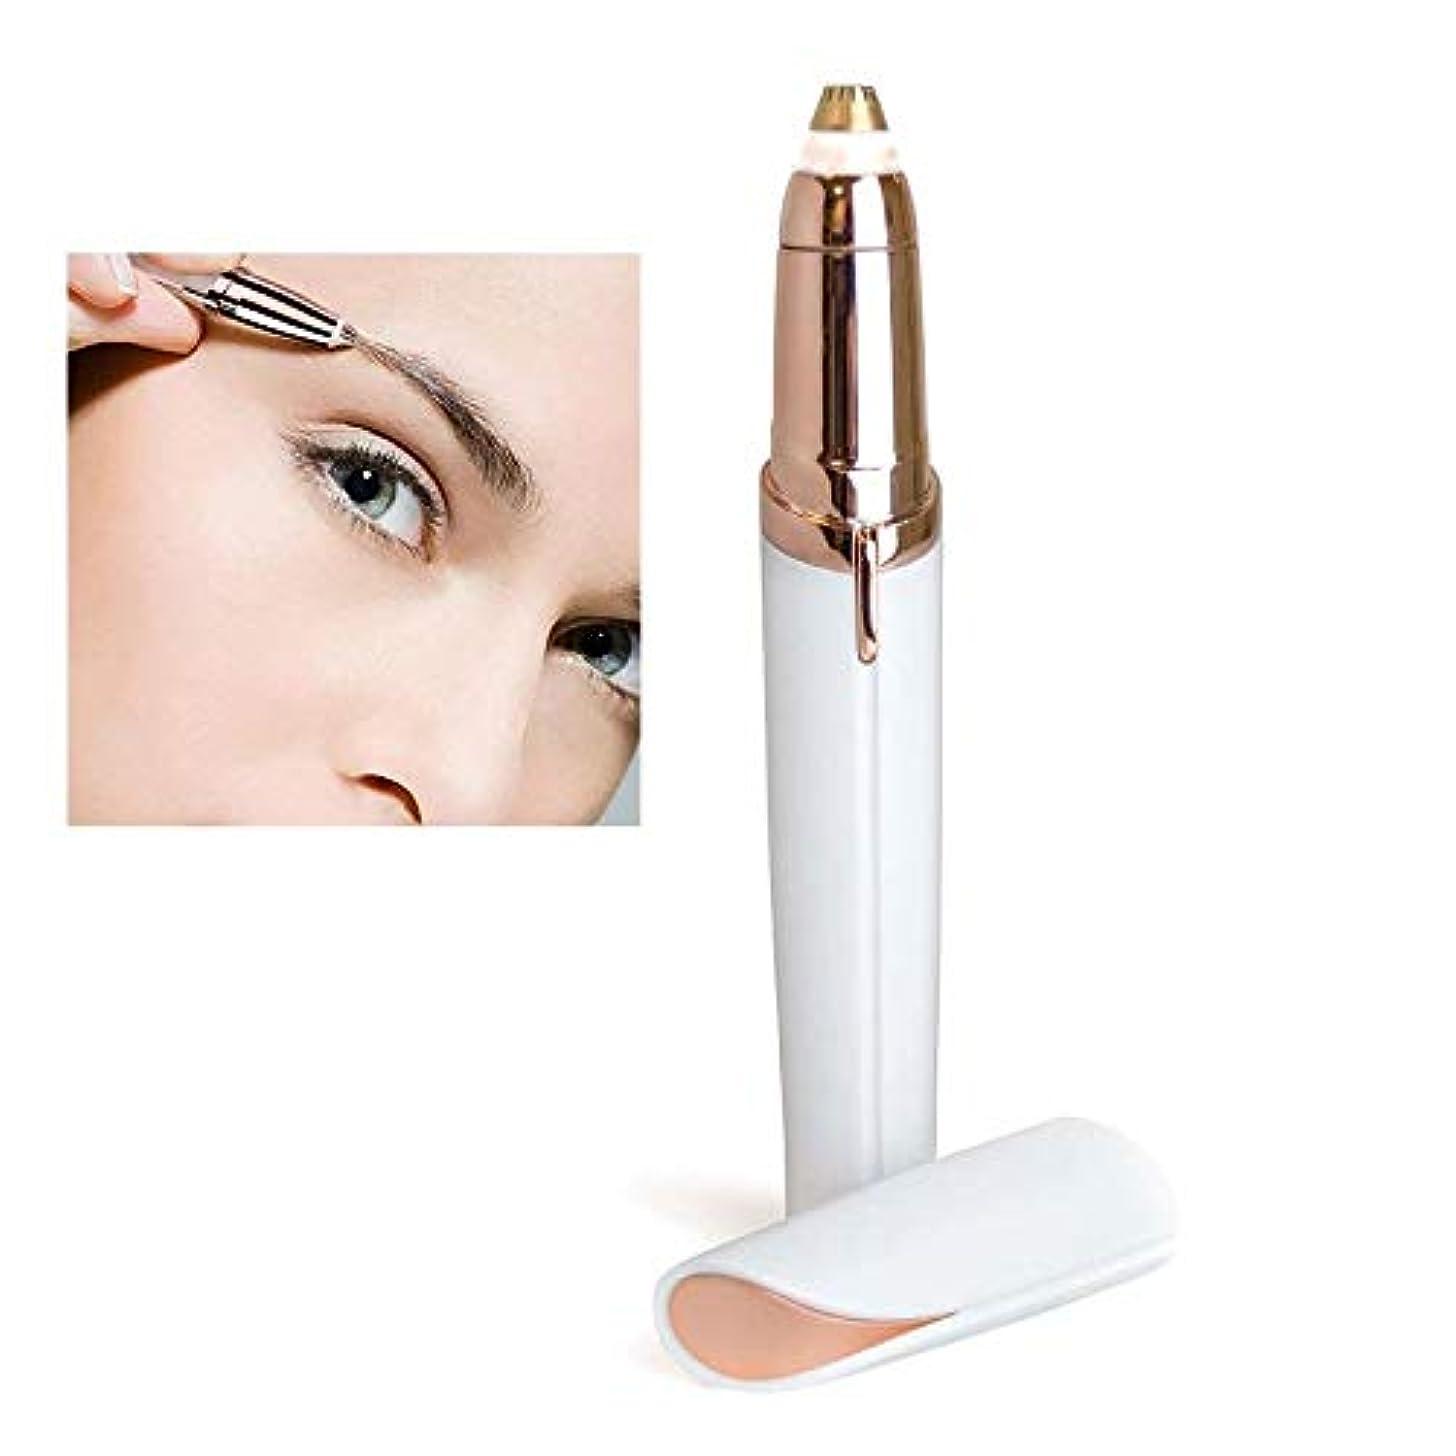 Thread Eyebrows Women Epilator Eyebrow Repair Hair Removal Machine Painless Mini Lipstick Epilator Hair Removal...